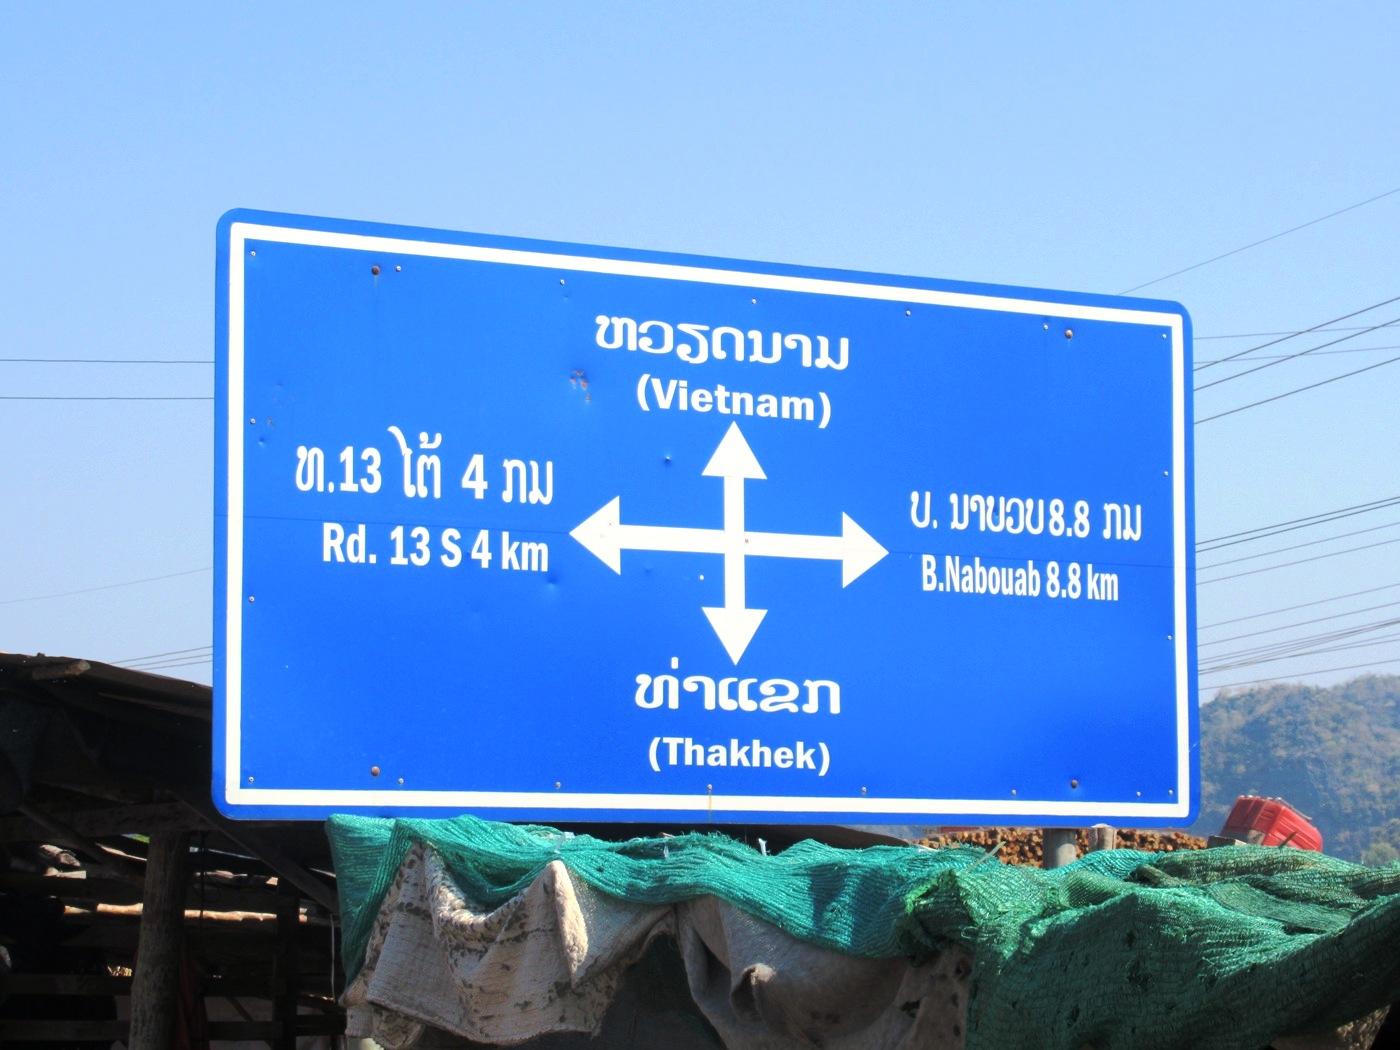 2019-12-laos-thakhek-loop-dia-1-01-inicio